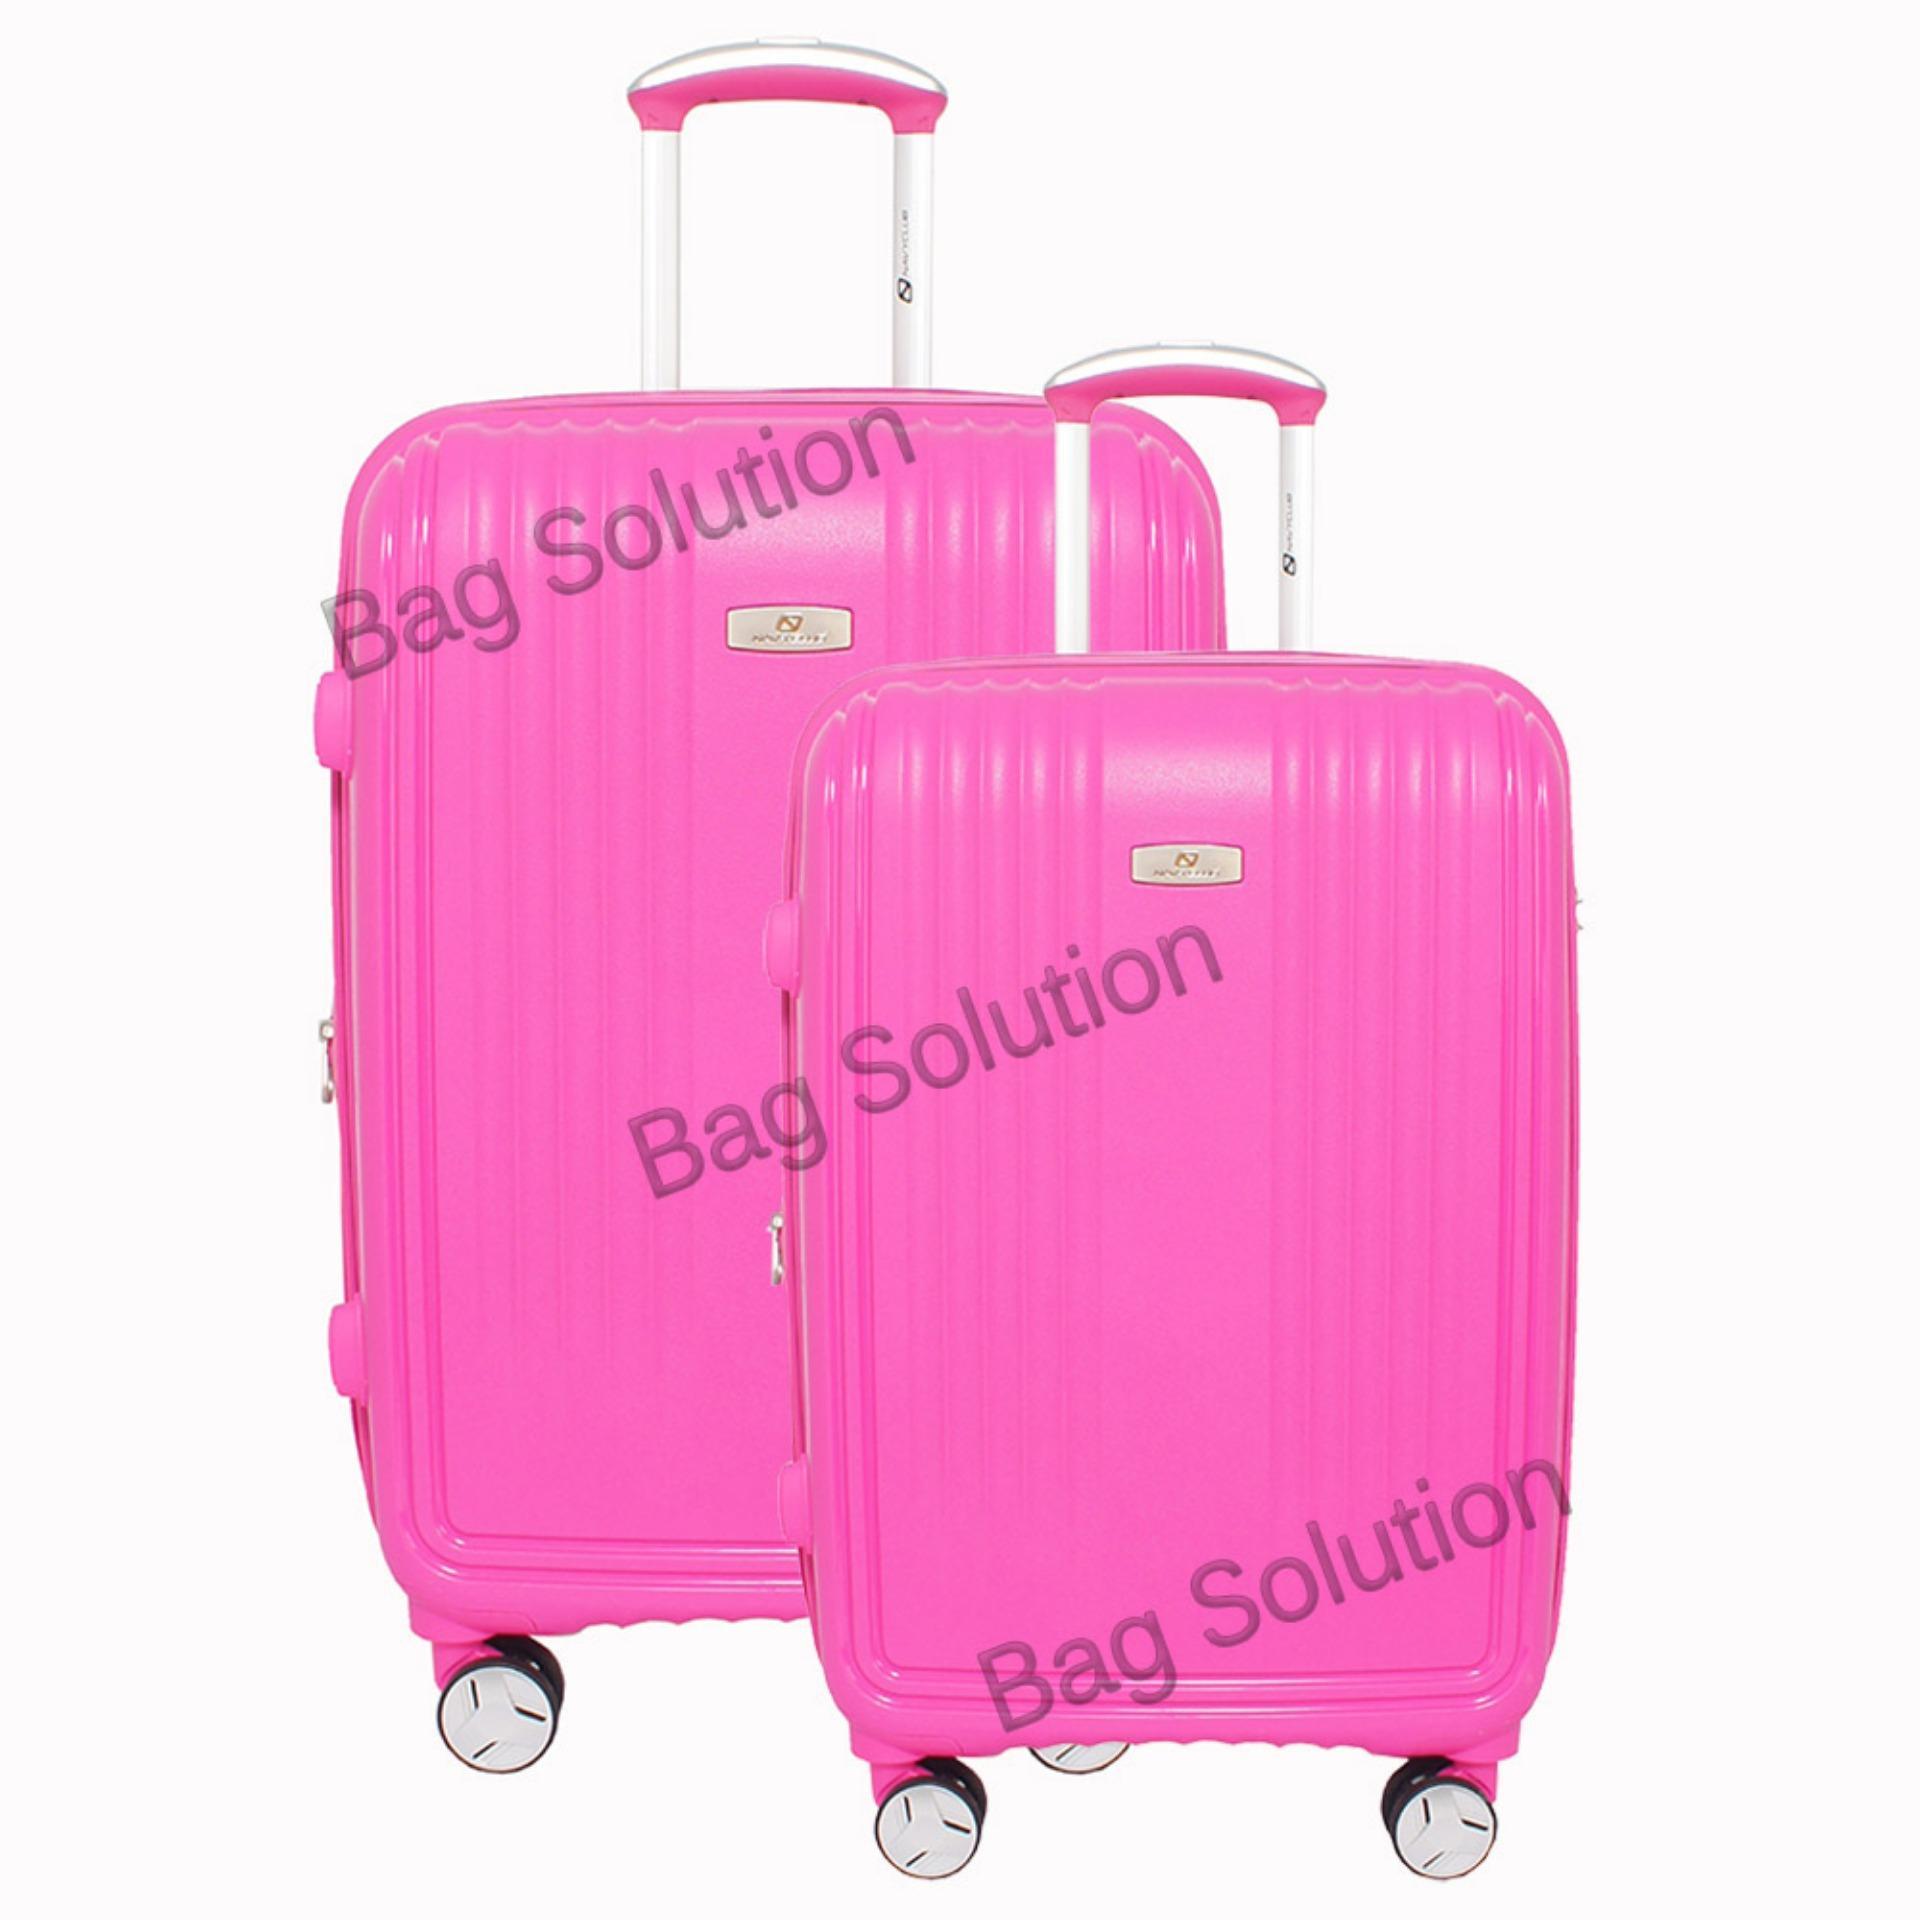 Navy Club Tas Koper Set Koper Hardcase Fiber PP - 4 Roda Putar Resleting Anti Tusuk - Kunci TSA - 3868 Size 20+24 Inch - Pink